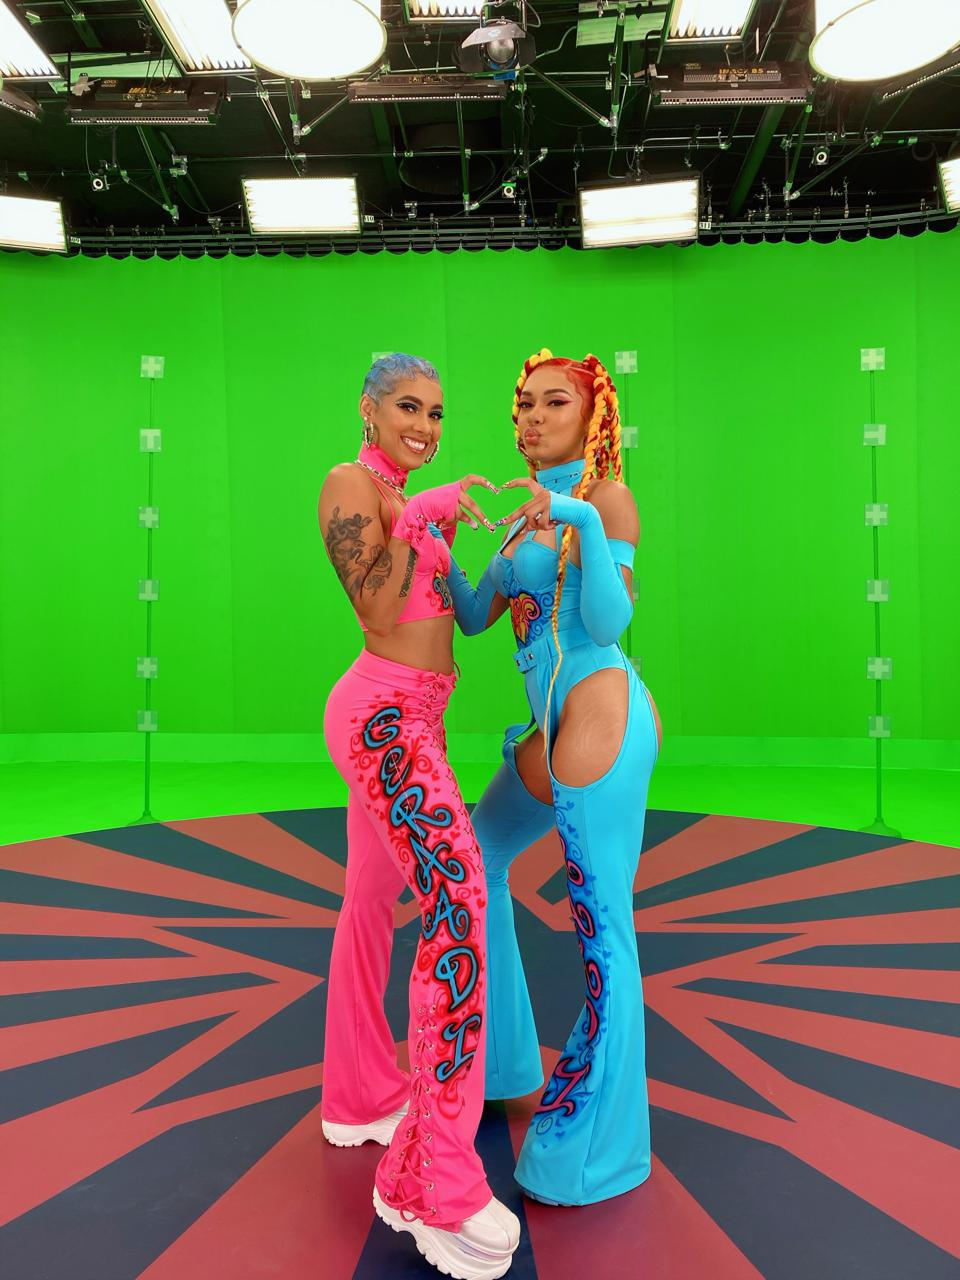 Saiyr and Emaza Gibson of Roc Nation's R&B/Hip Hop Sister Duo Ceraadi